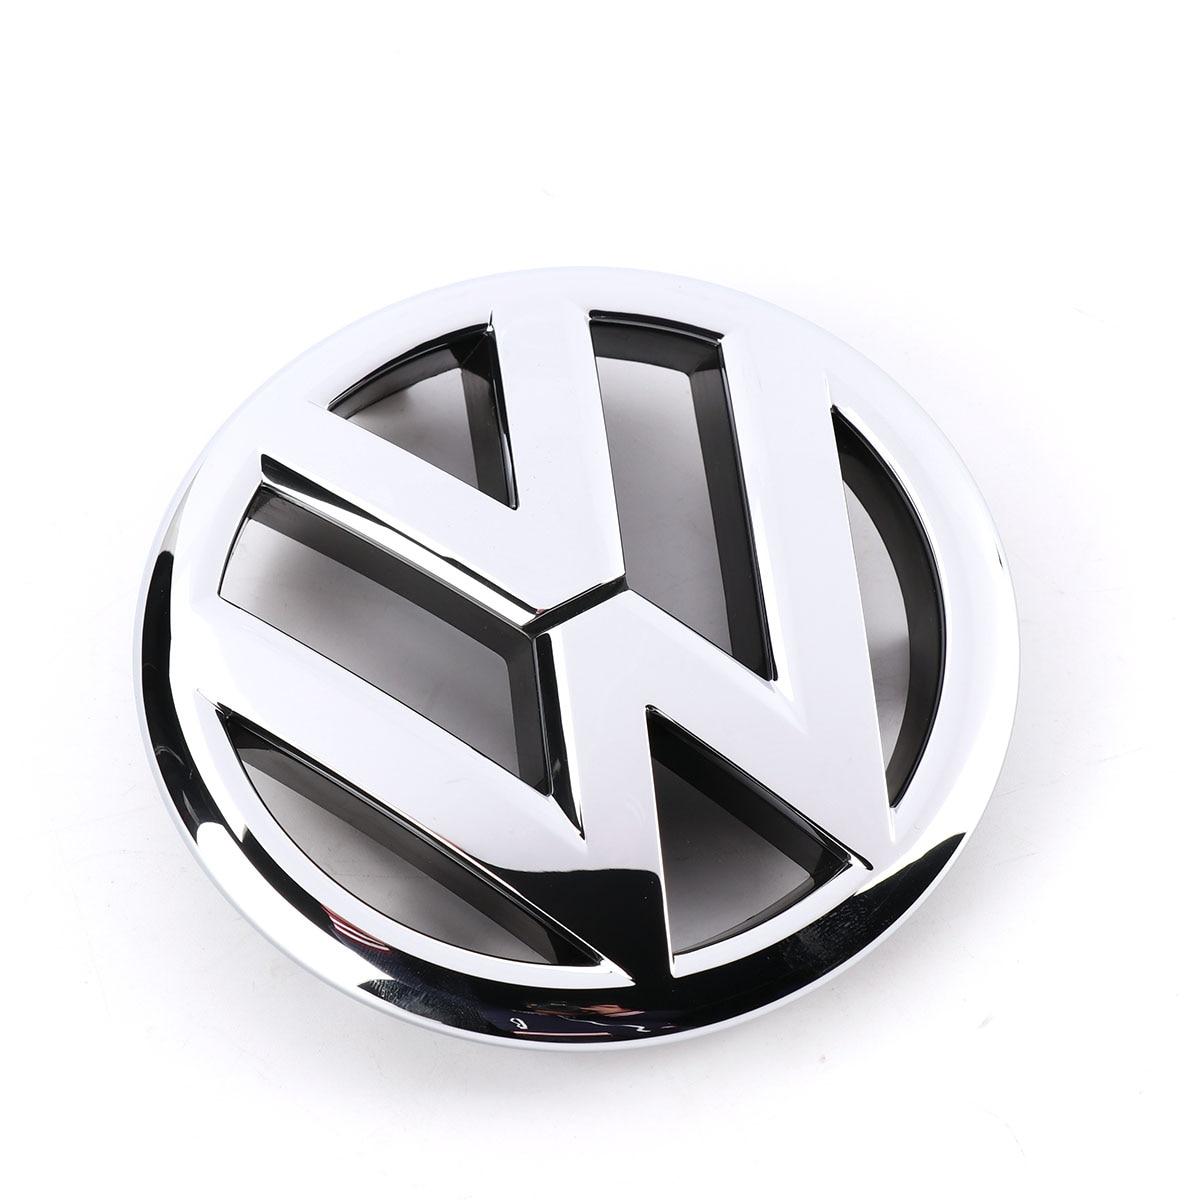 Car Auto emblema VW OEM cromo parrilla delantera etiqueta insignia para Volkswagen Jetta MK6 Sedan 2011-2015 5C6853601ULM